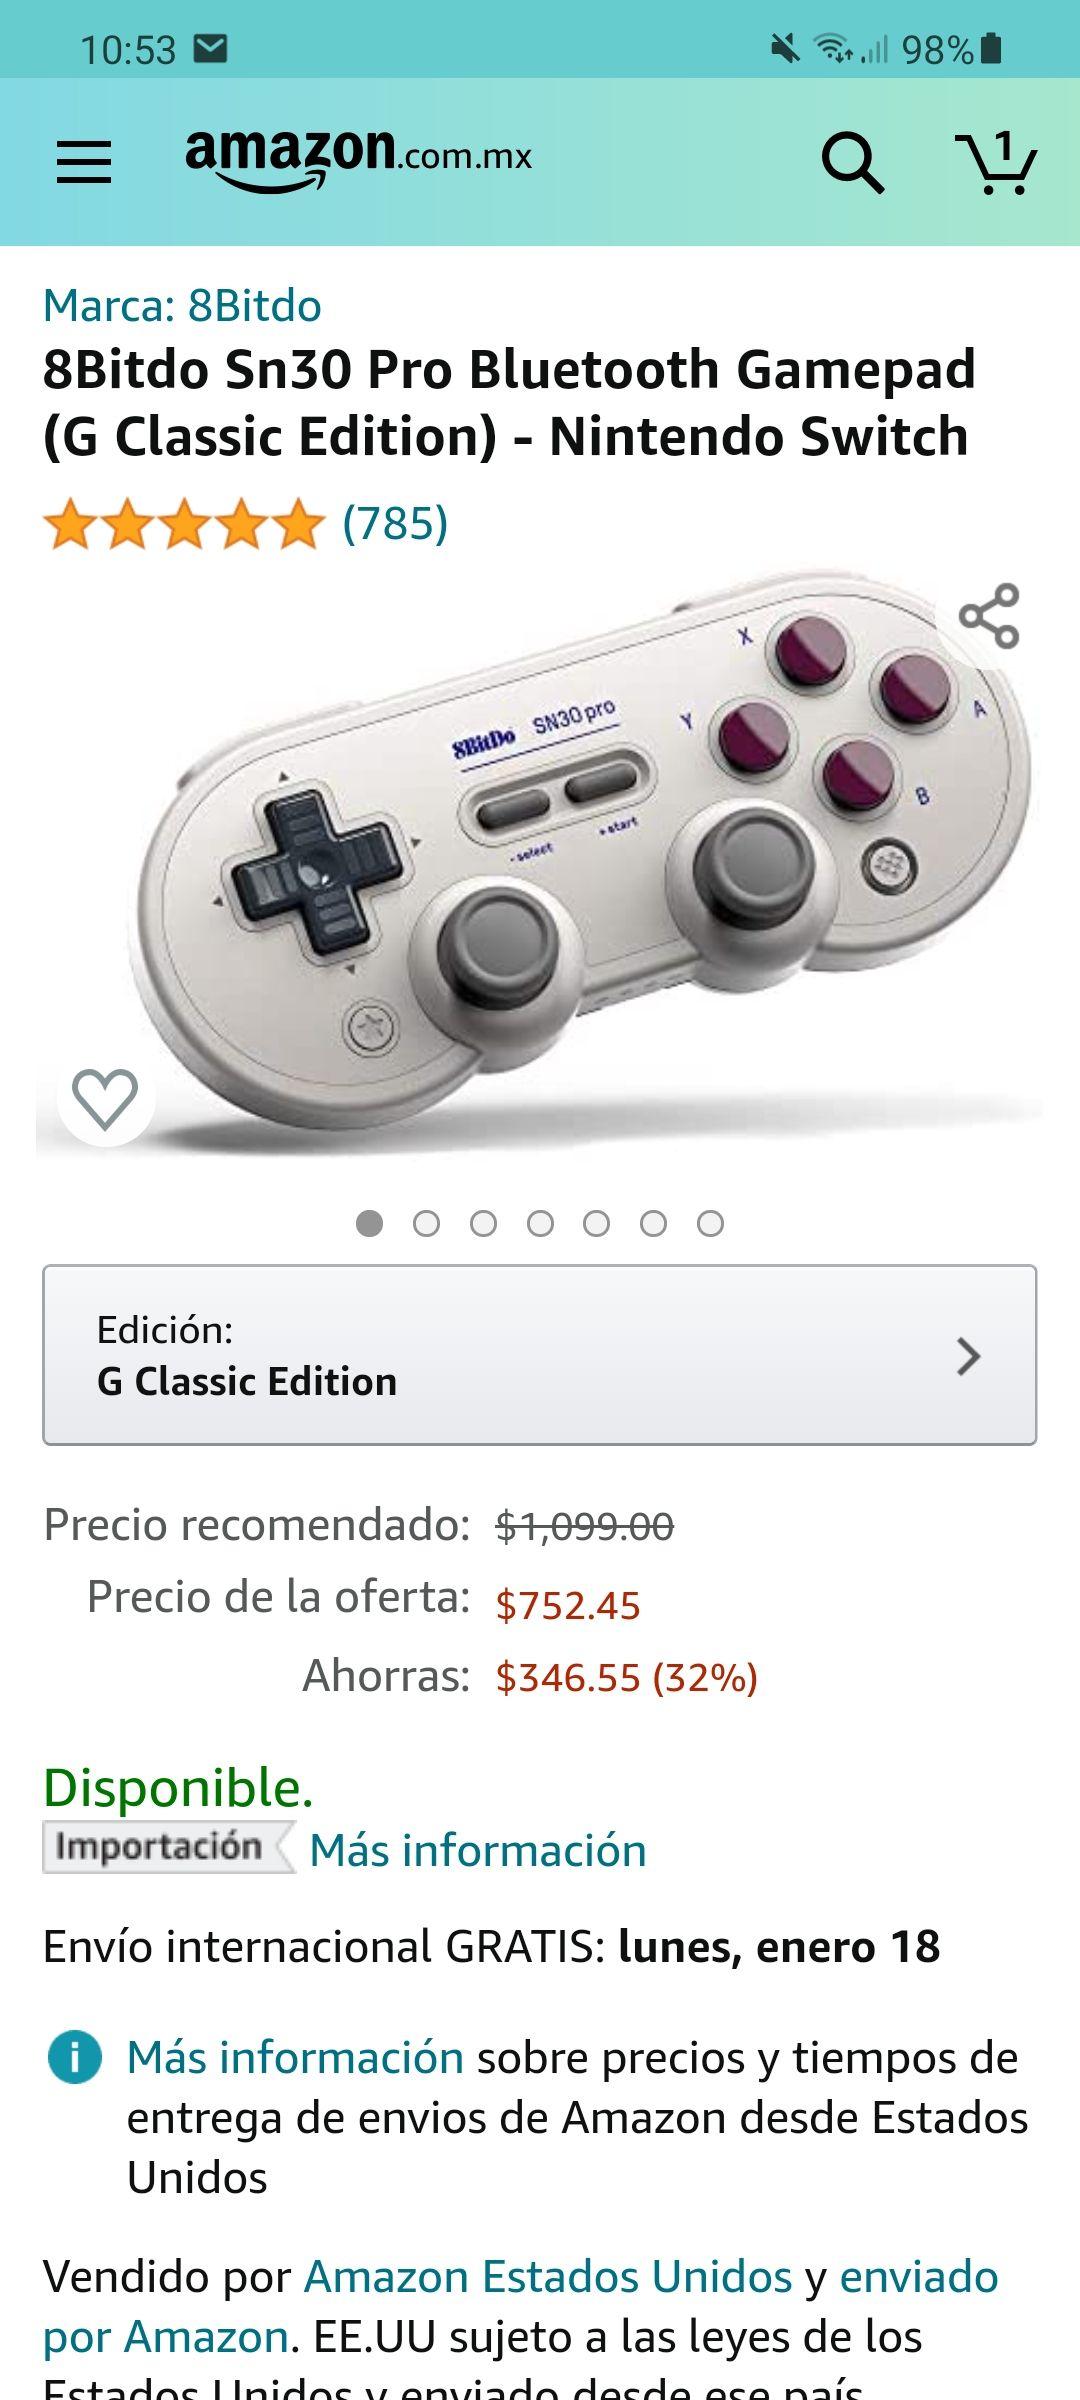 Amazon: 8Bitdo Sn30 Pro Bluetooth Gamepad (G Classic Edition)